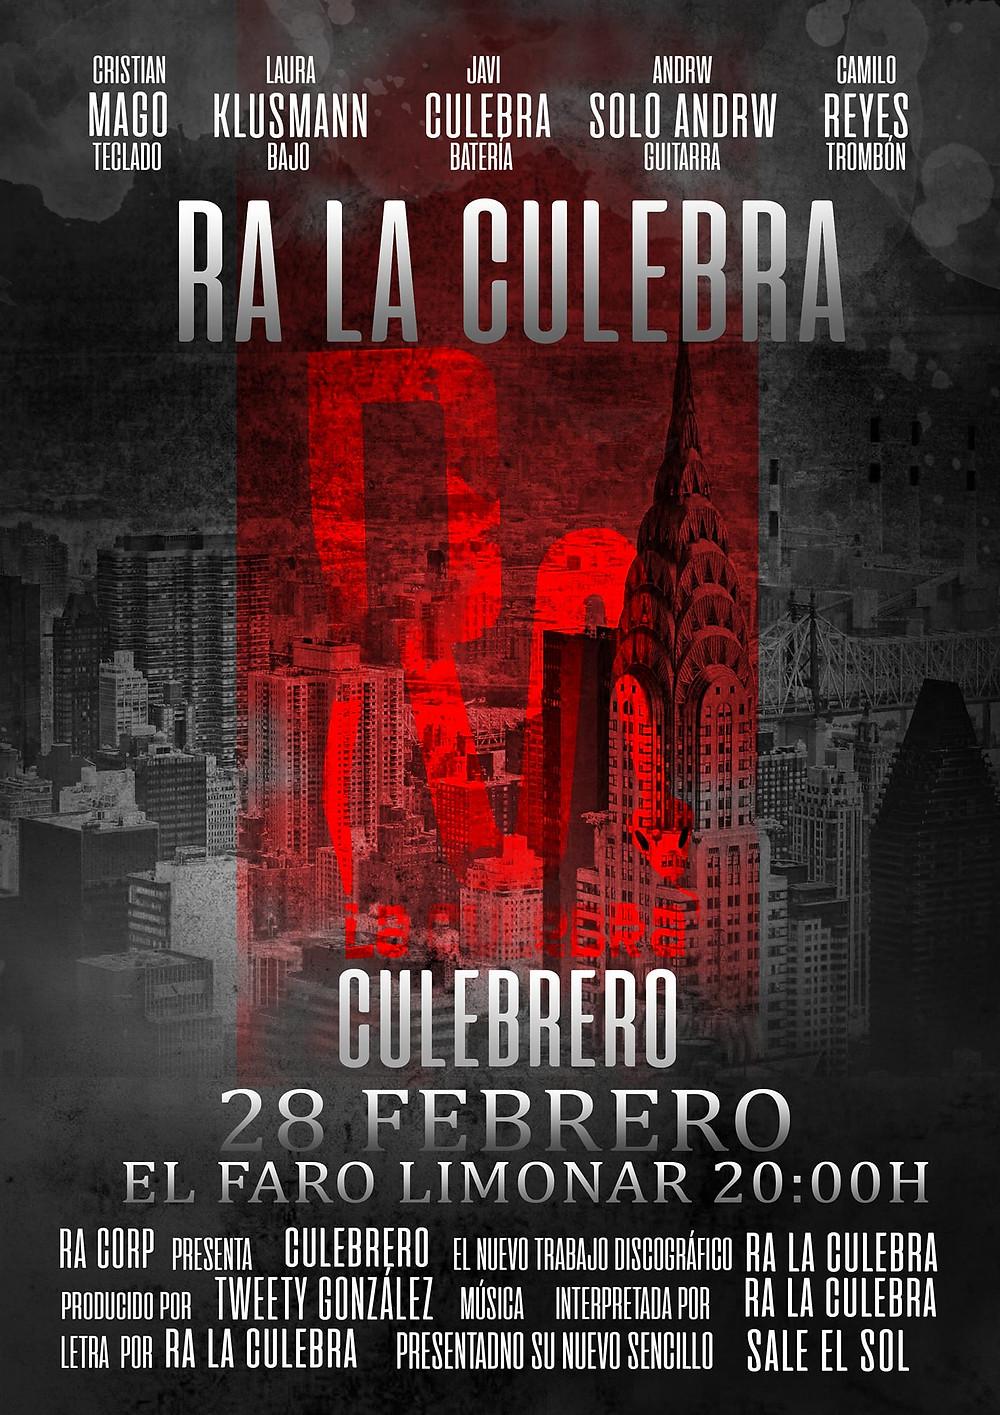 Ra La Culebra lanza Culebrero